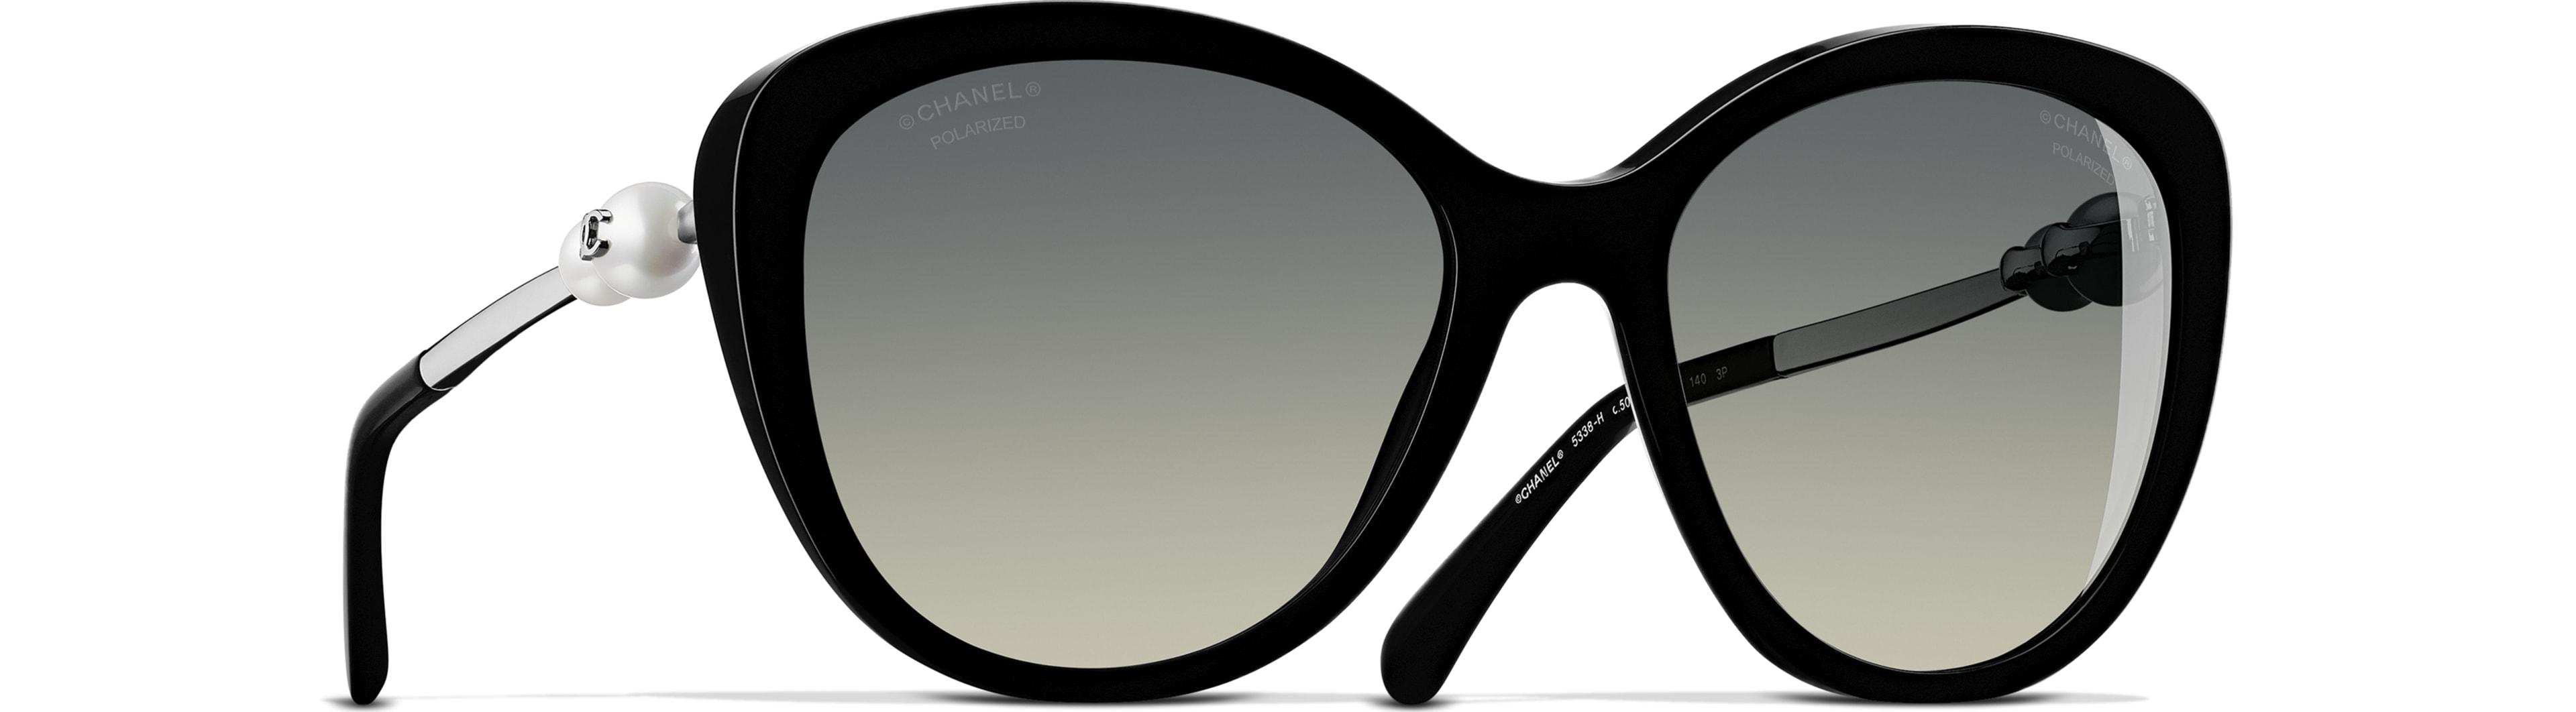 Acetate & Imitation Pearls black frame. Grey gradient lenses